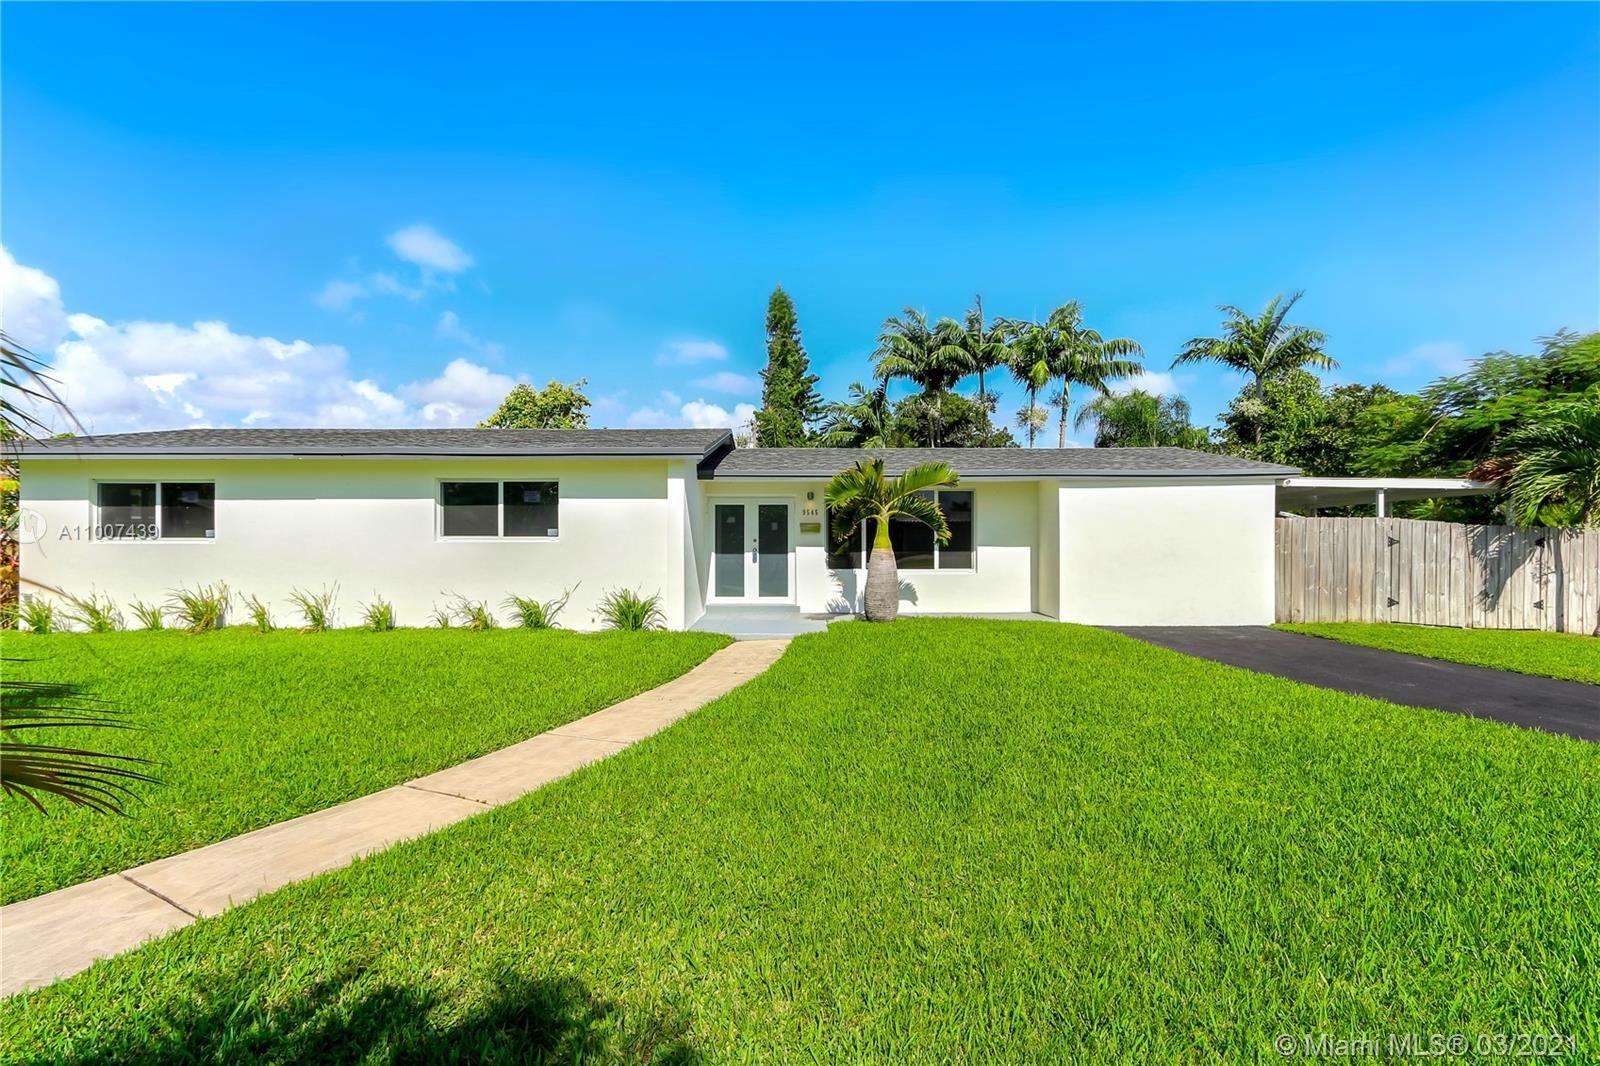 9545 SW 183rd St, Palmetto Bay, FL 33157 - #: A11007439